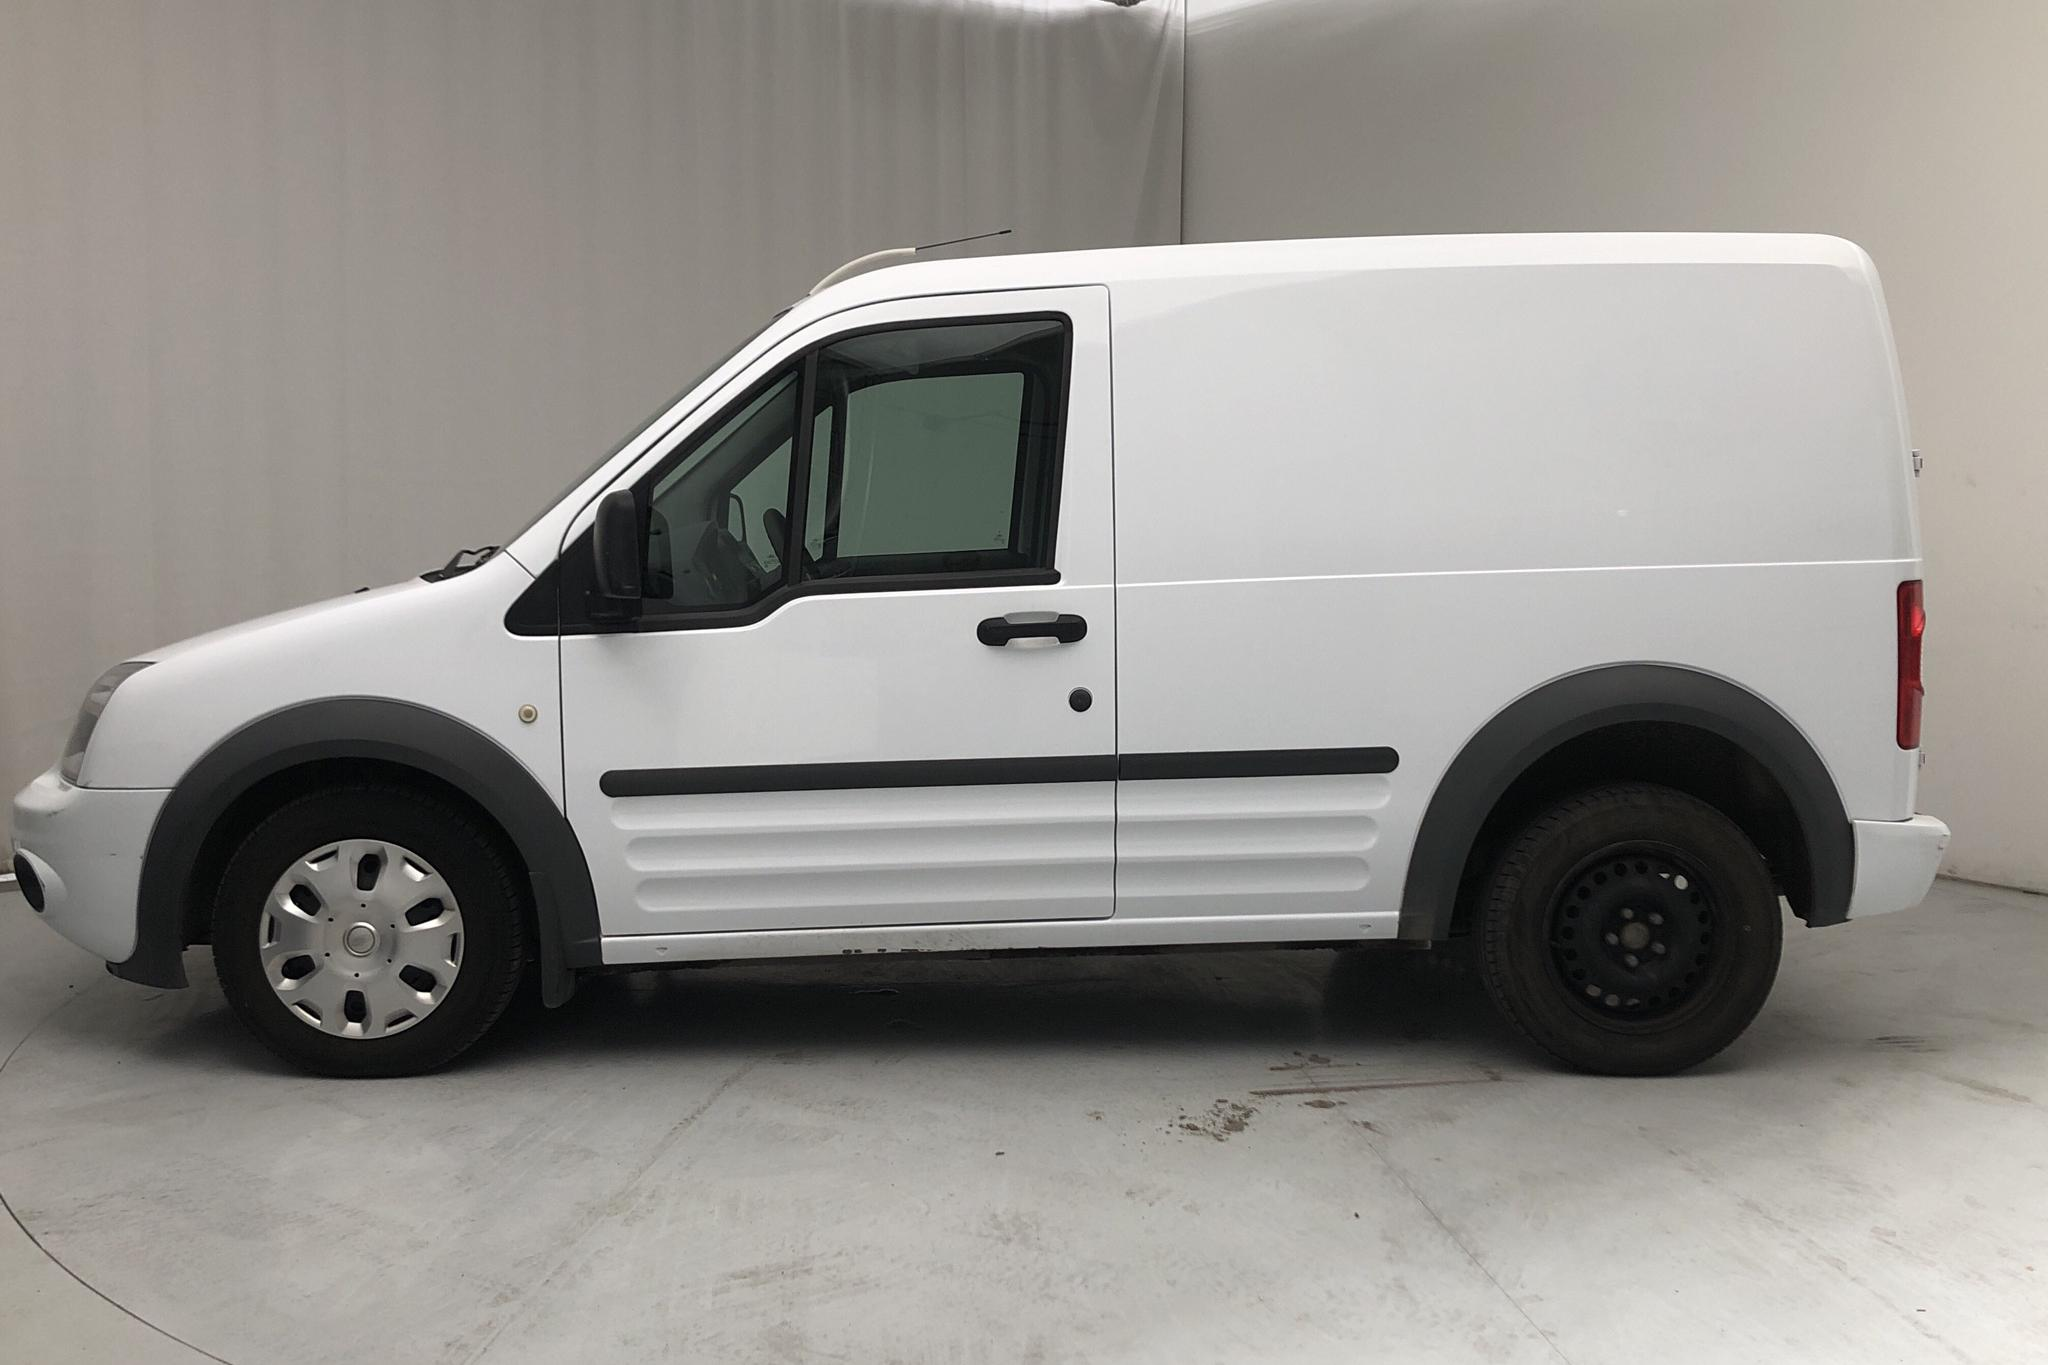 Ford Transit Connect 1.8 TDCi (90hk) - 7 134 mil - Manuell - vit - 2010